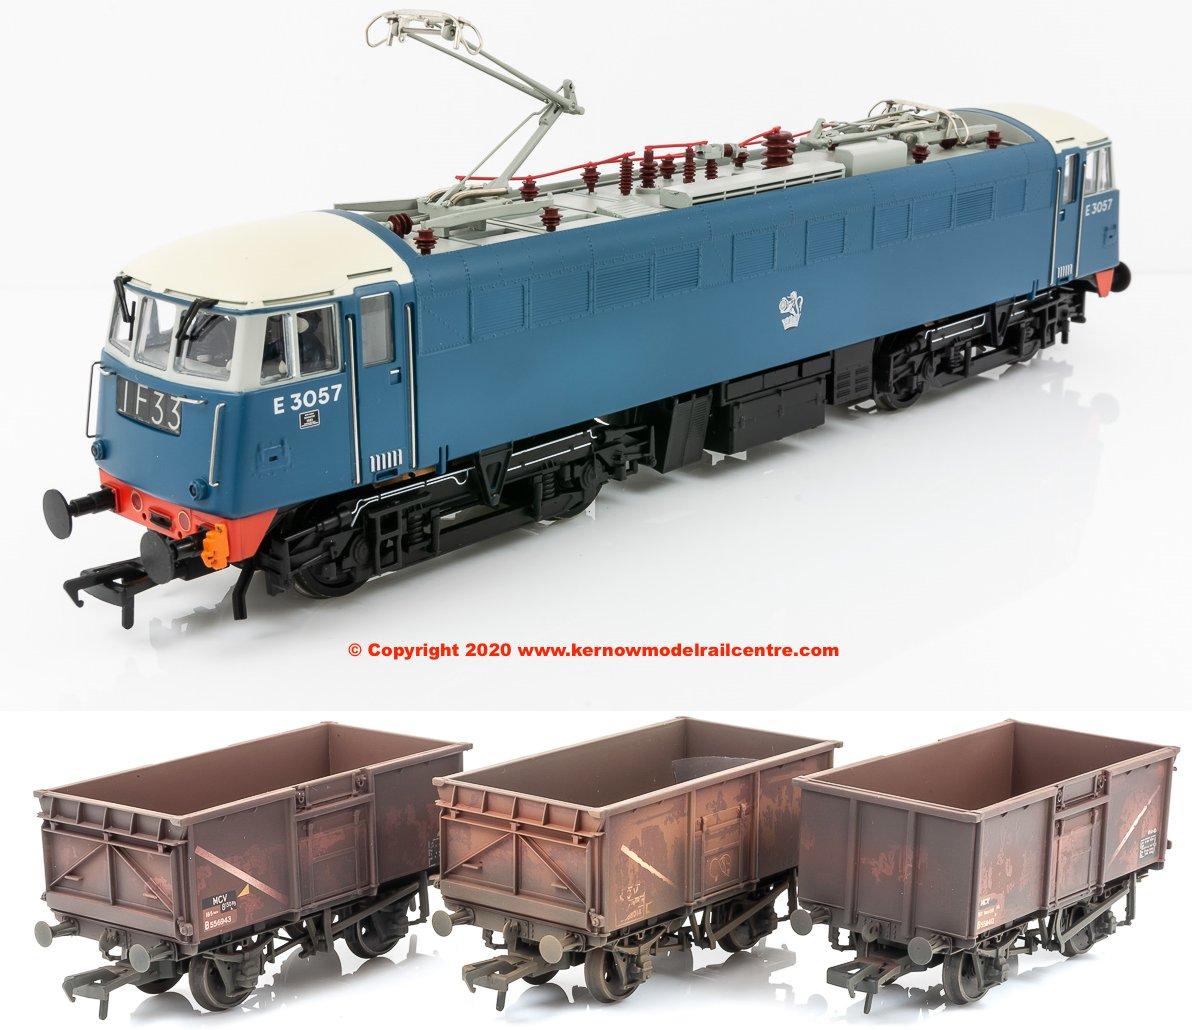 31-676APACK Bachmann Class 85 Electric Loco E3057 + 37-238Z image